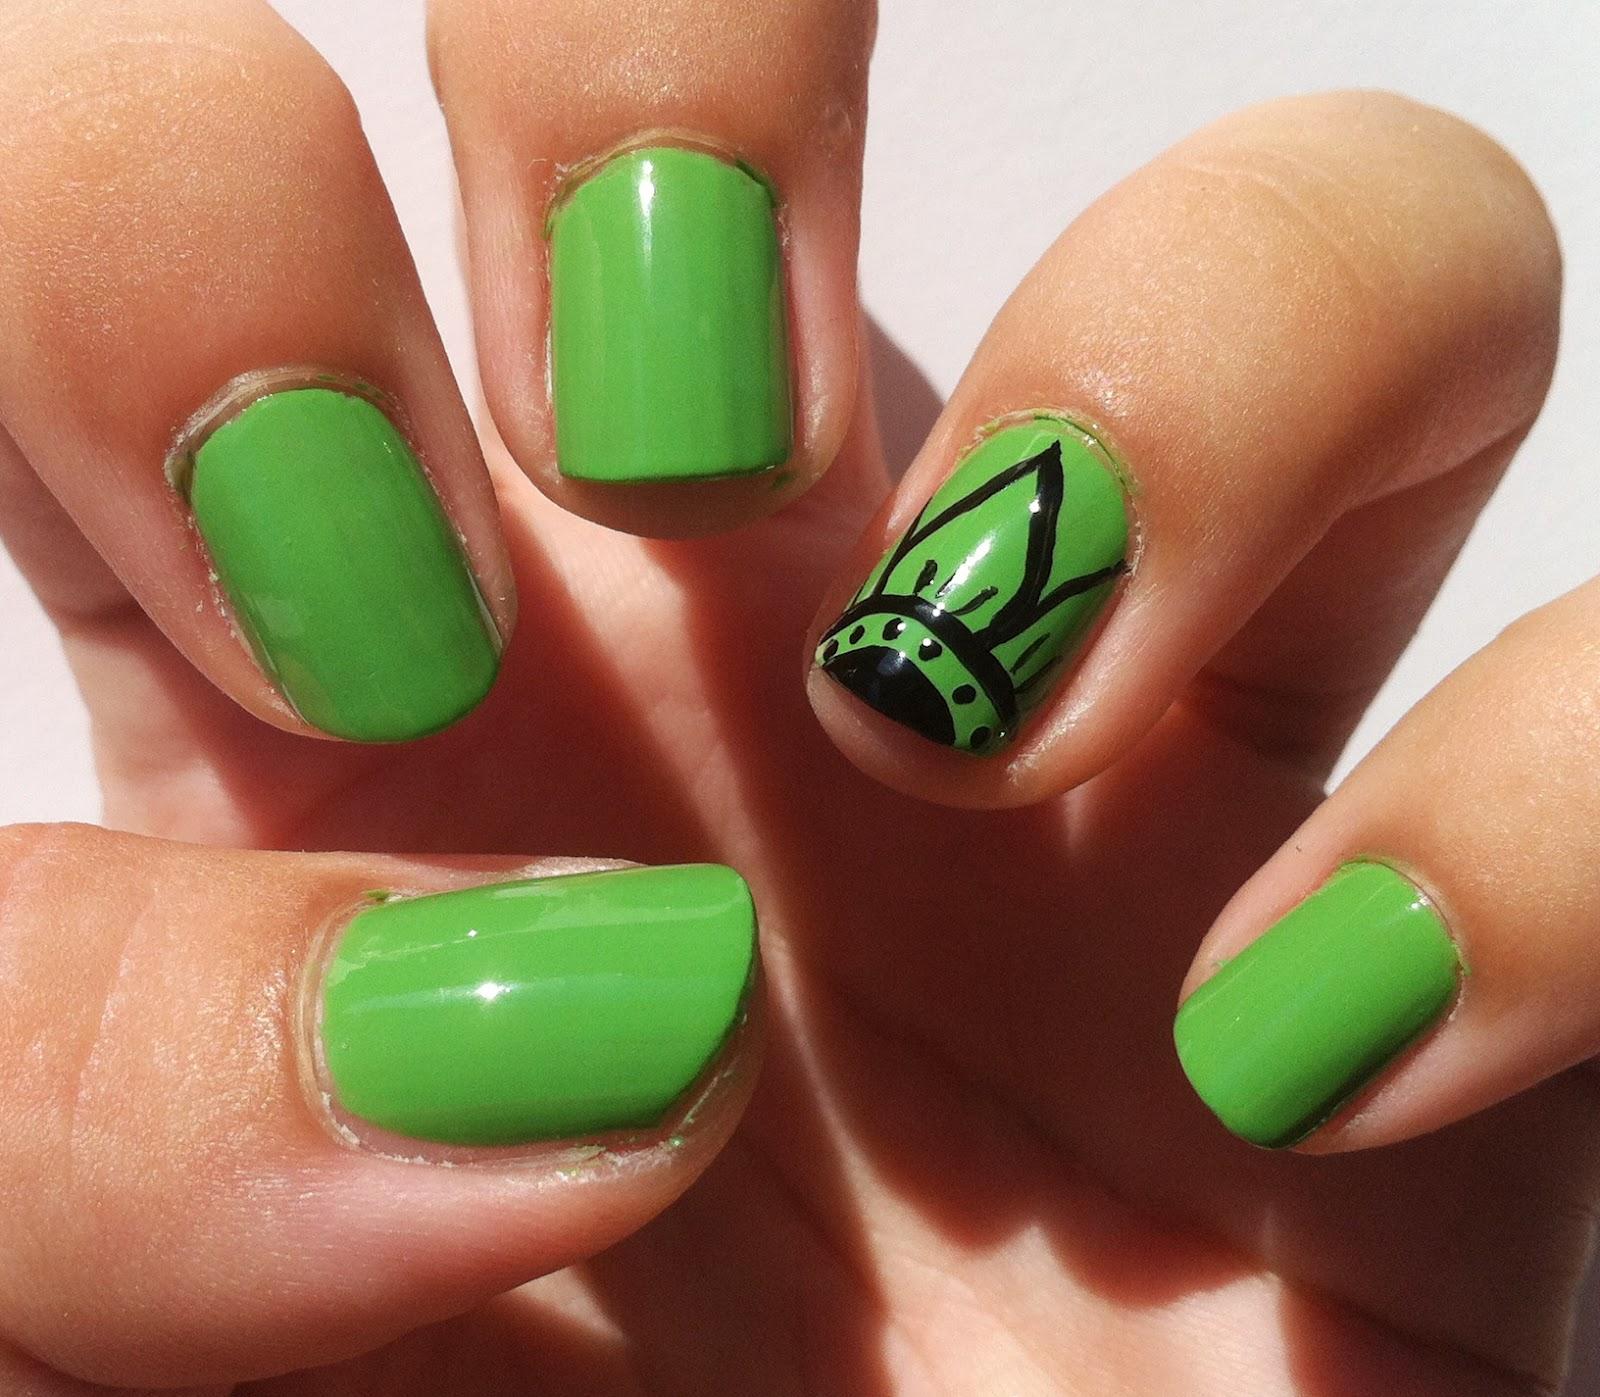 sabrina 39 s make up diary flower on green nail design. Black Bedroom Furniture Sets. Home Design Ideas